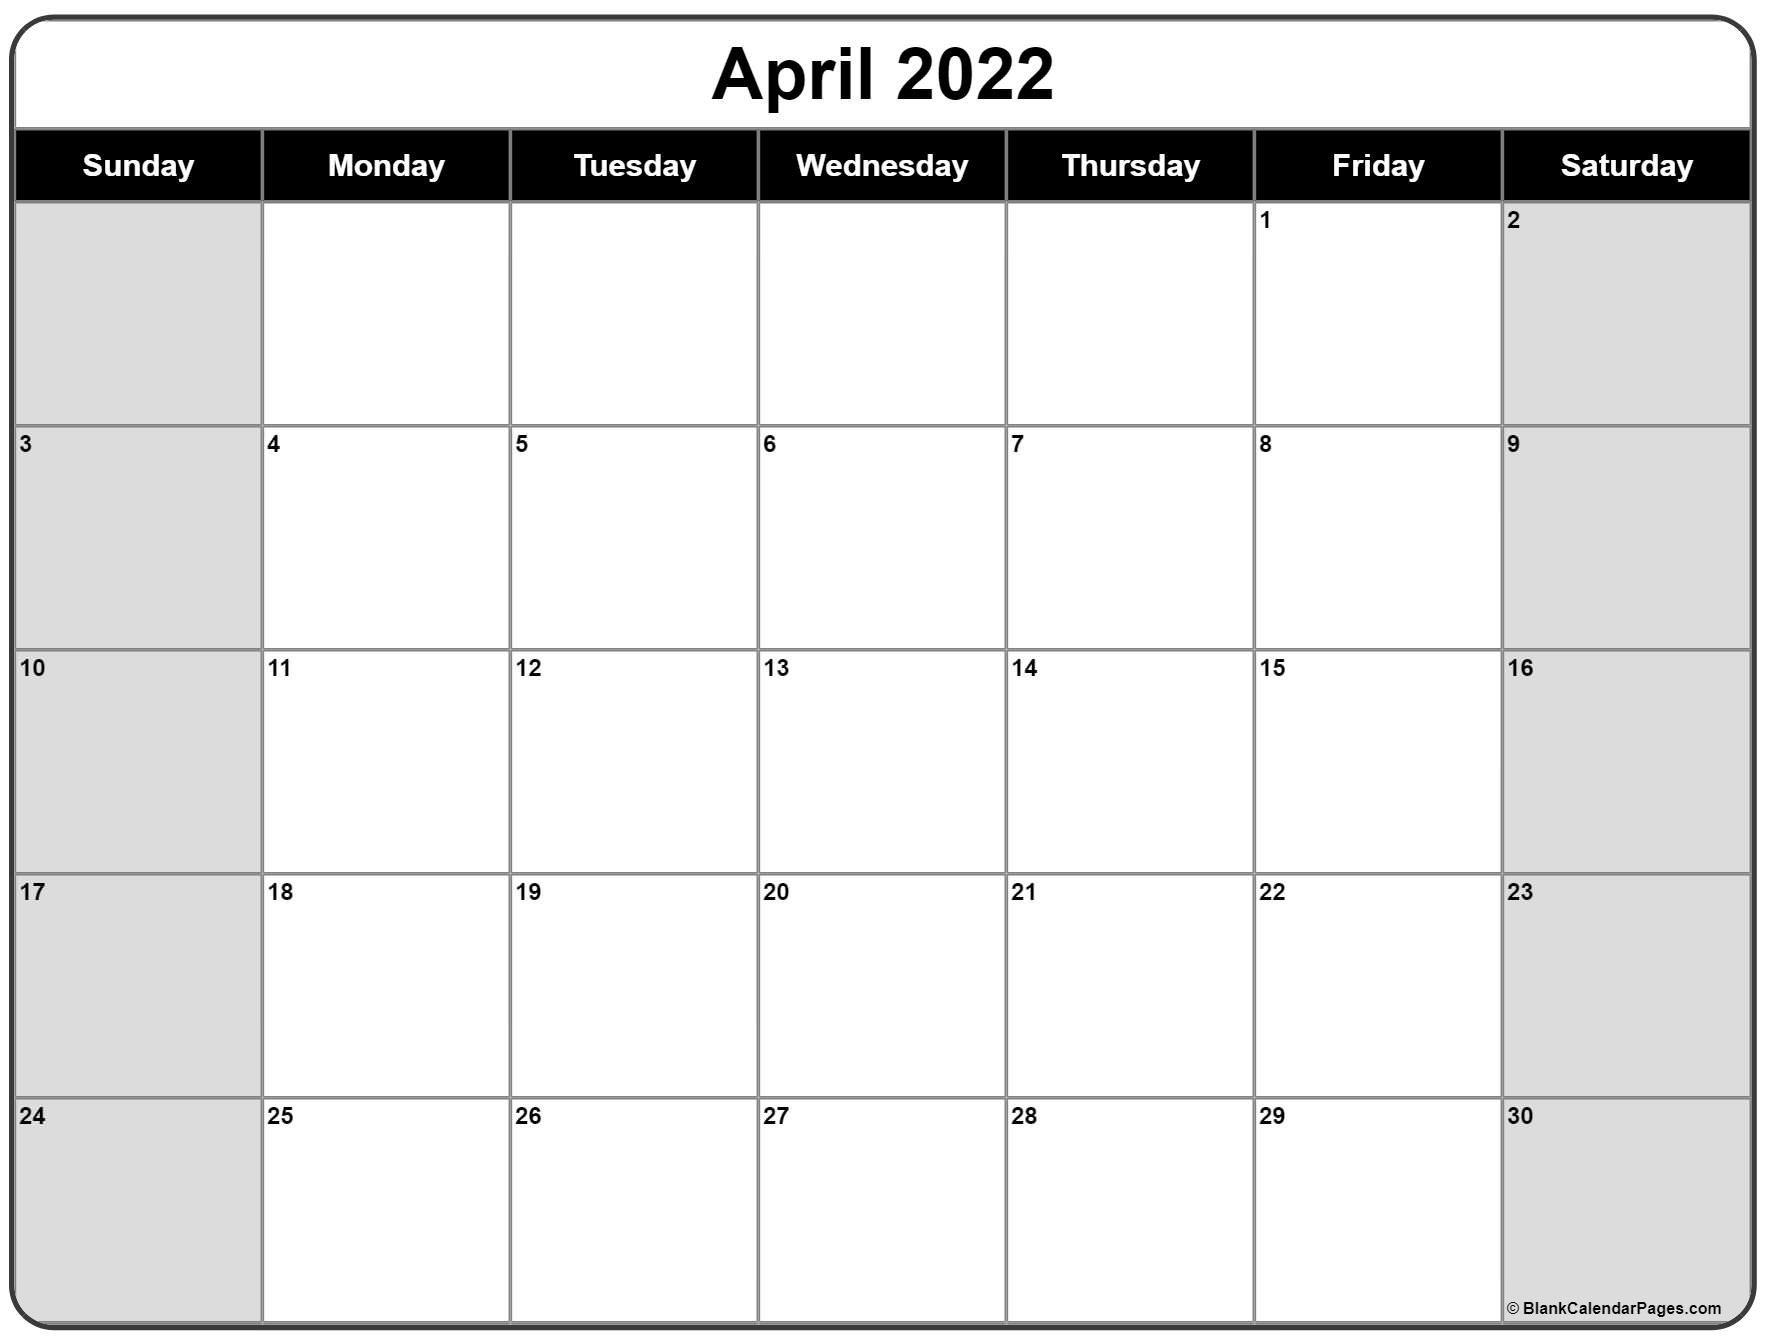 April 2022 Calendar   Free Printable Calendar Templates regarding Printable Calendar April 2022 Free